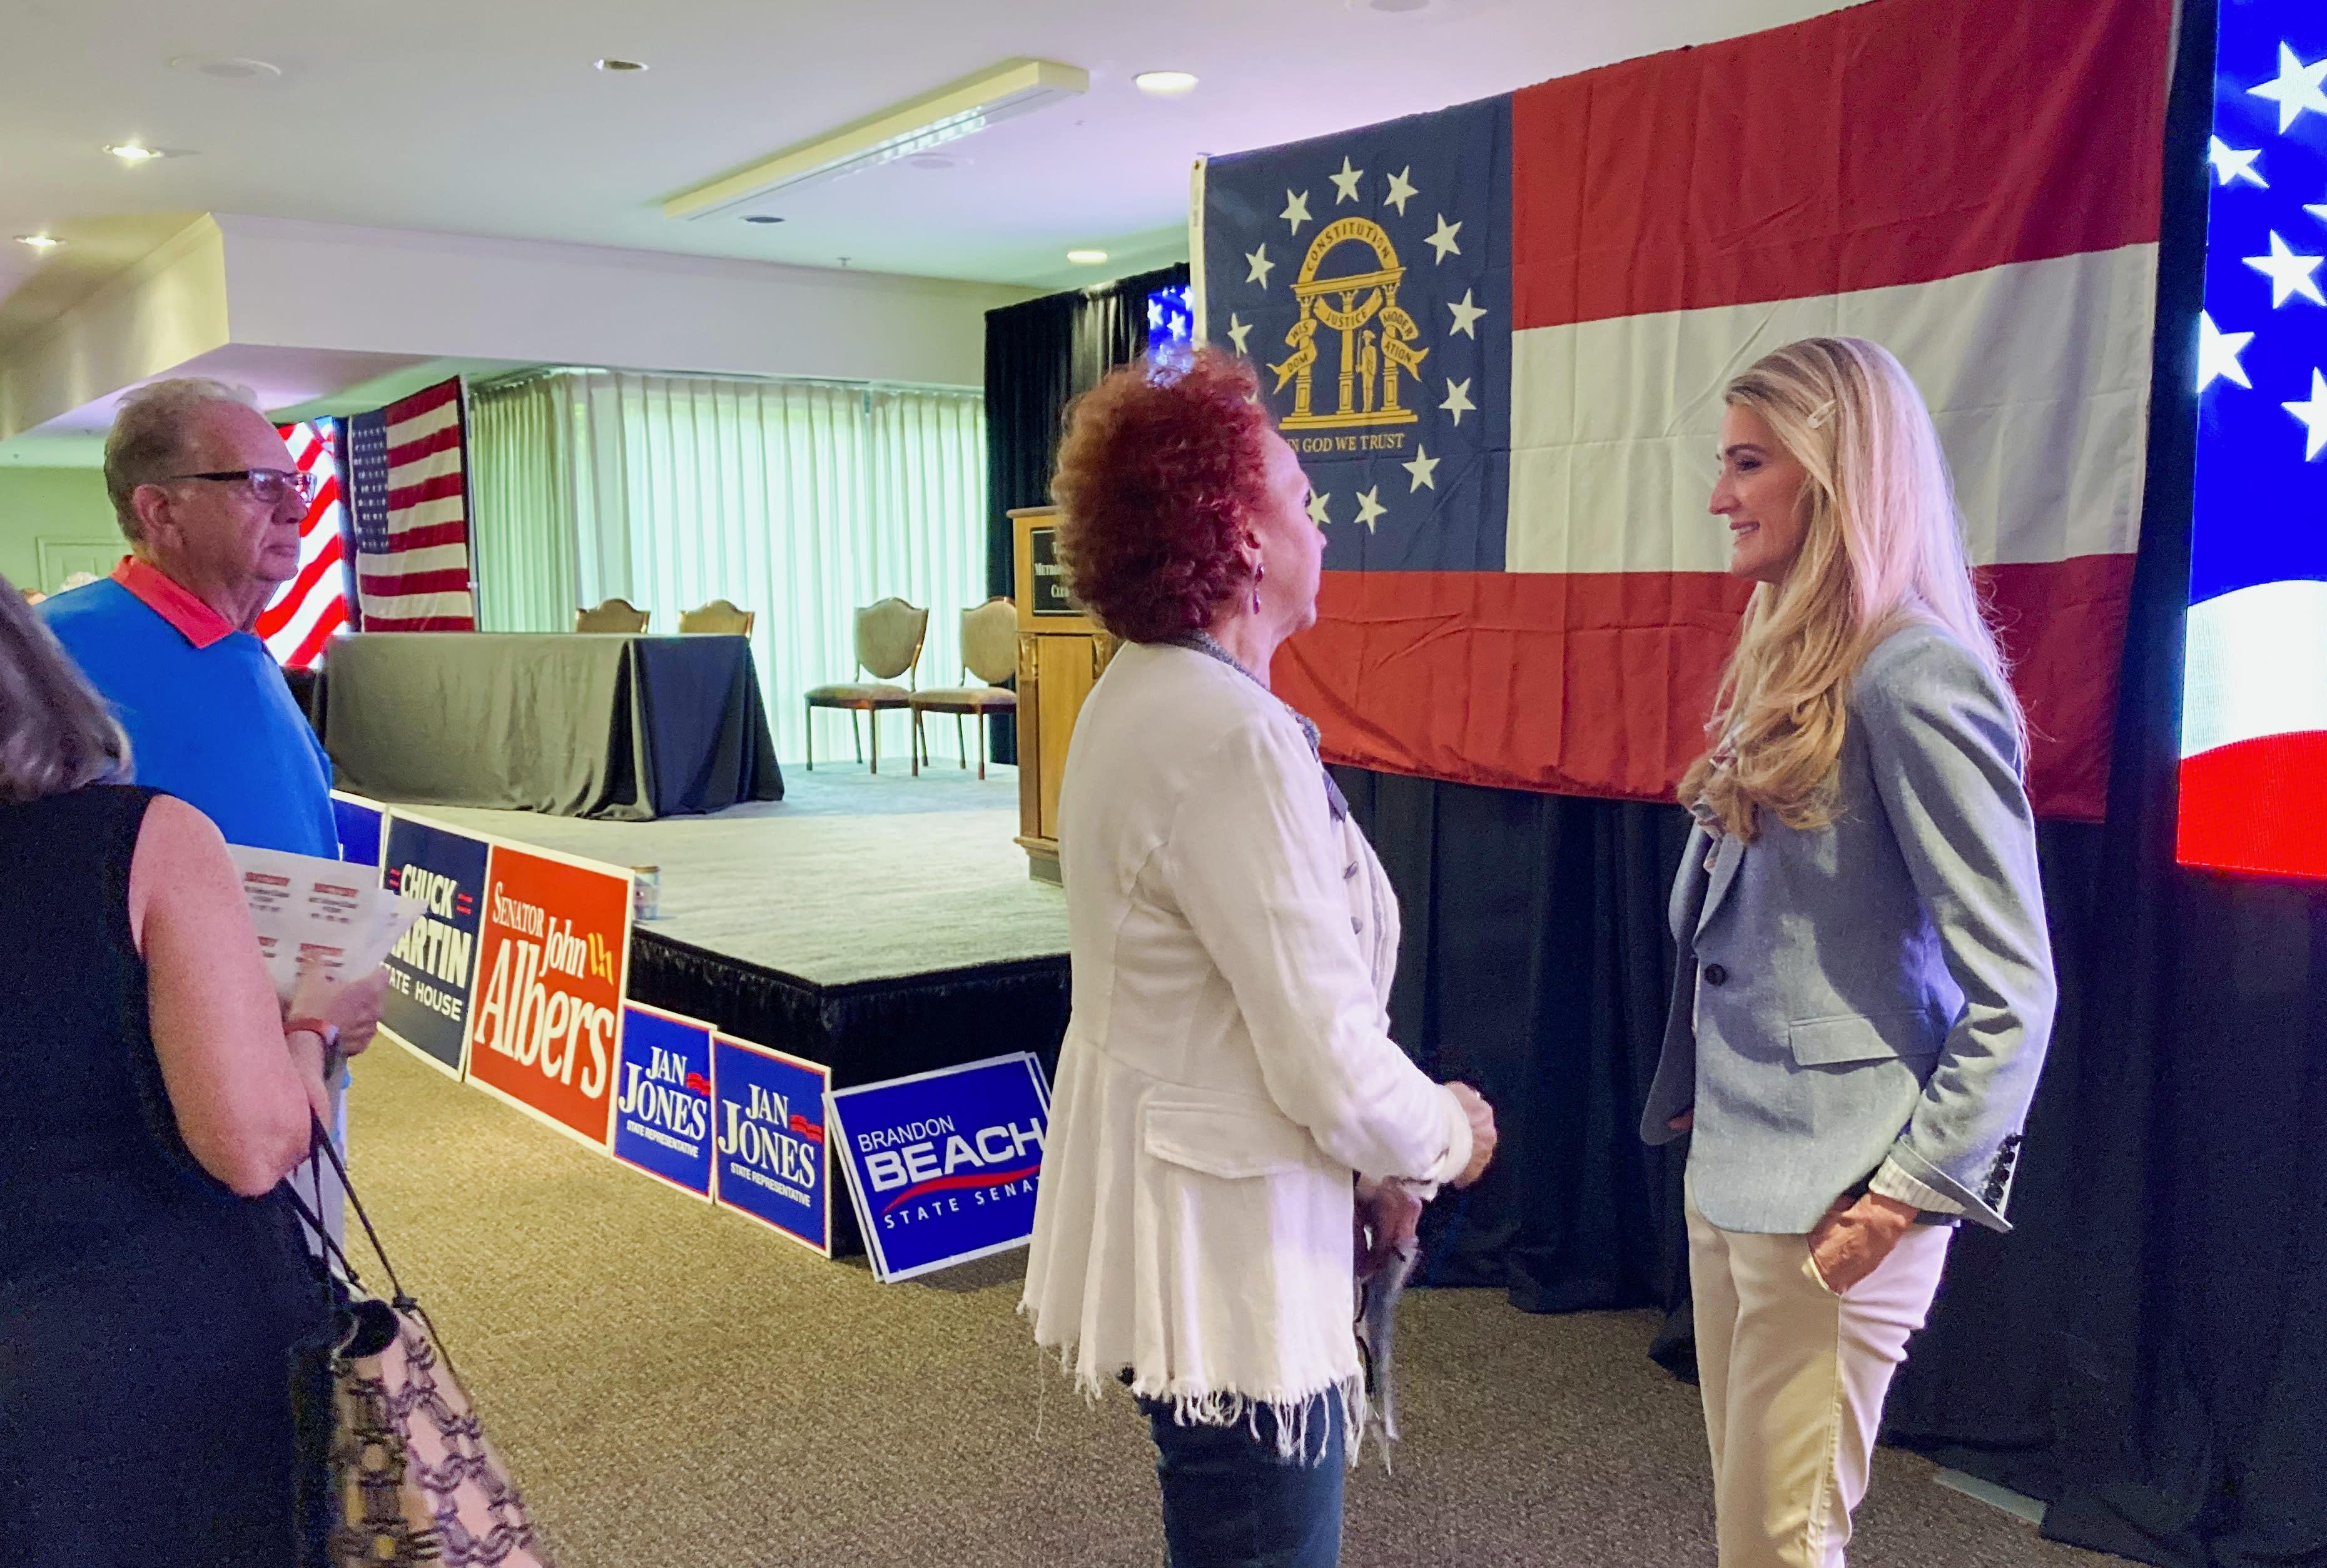 Trump loyalists aim to test Georgia's GOP governor